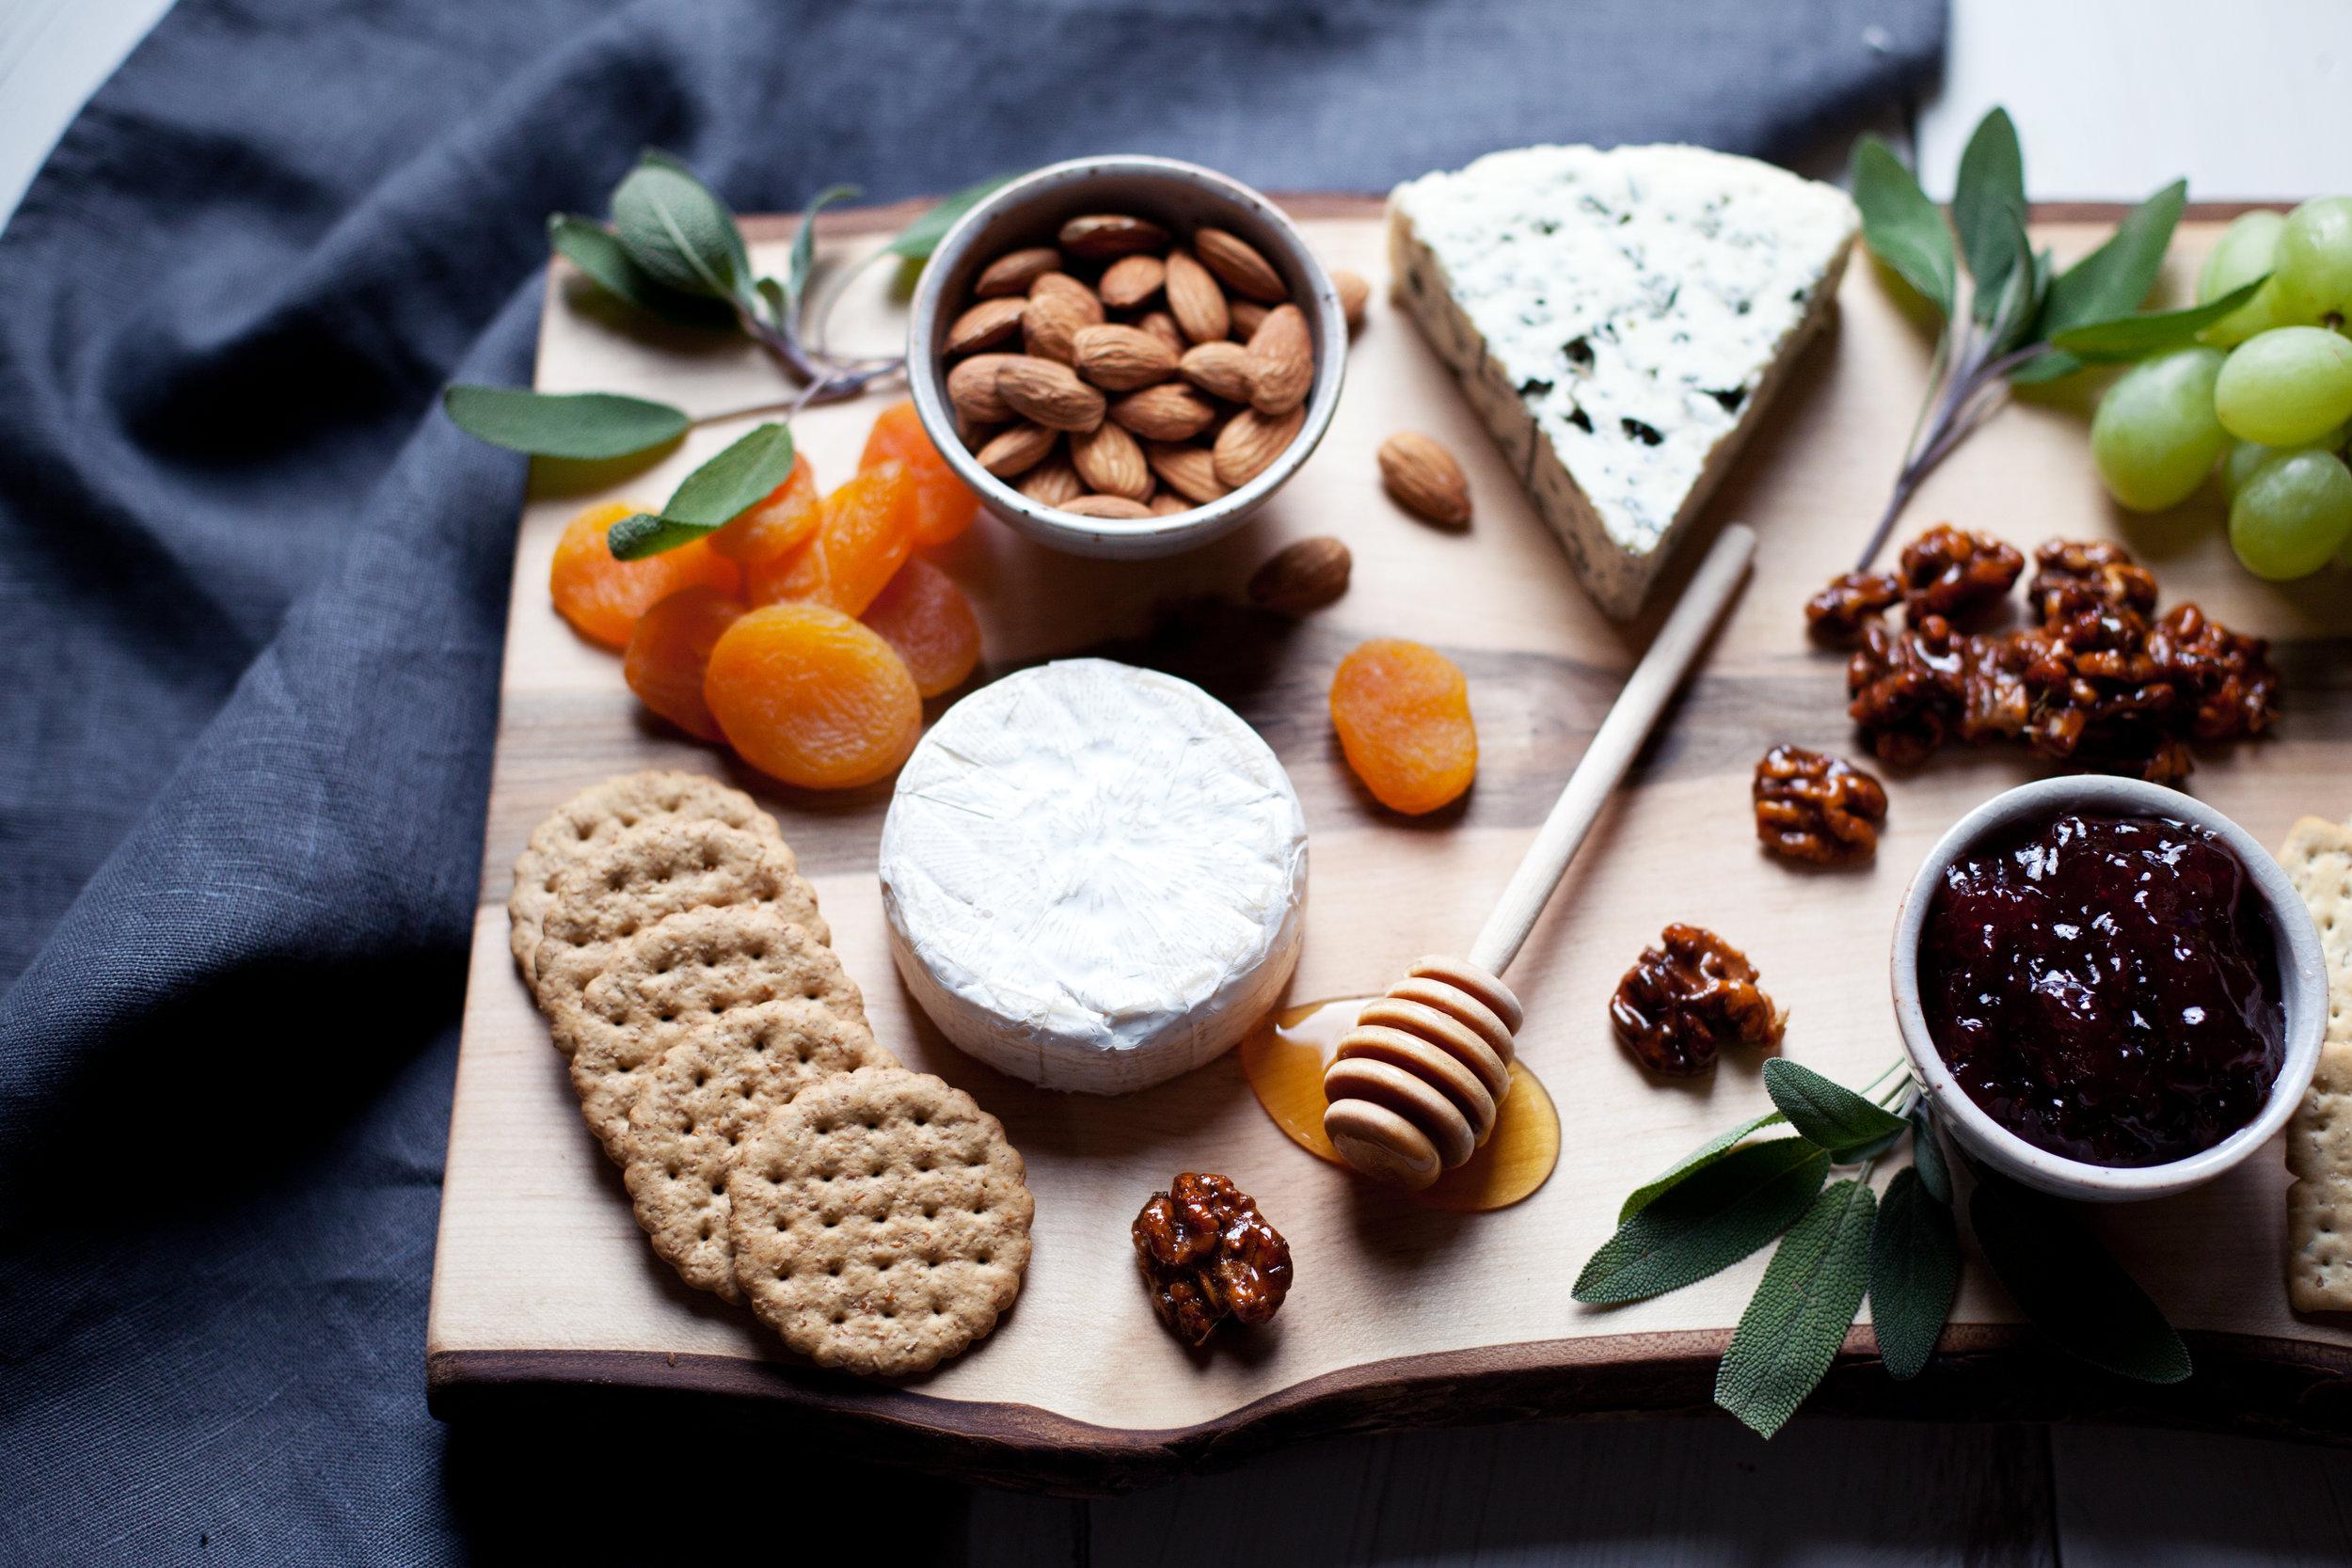 castello sweet cheese board v.jpg